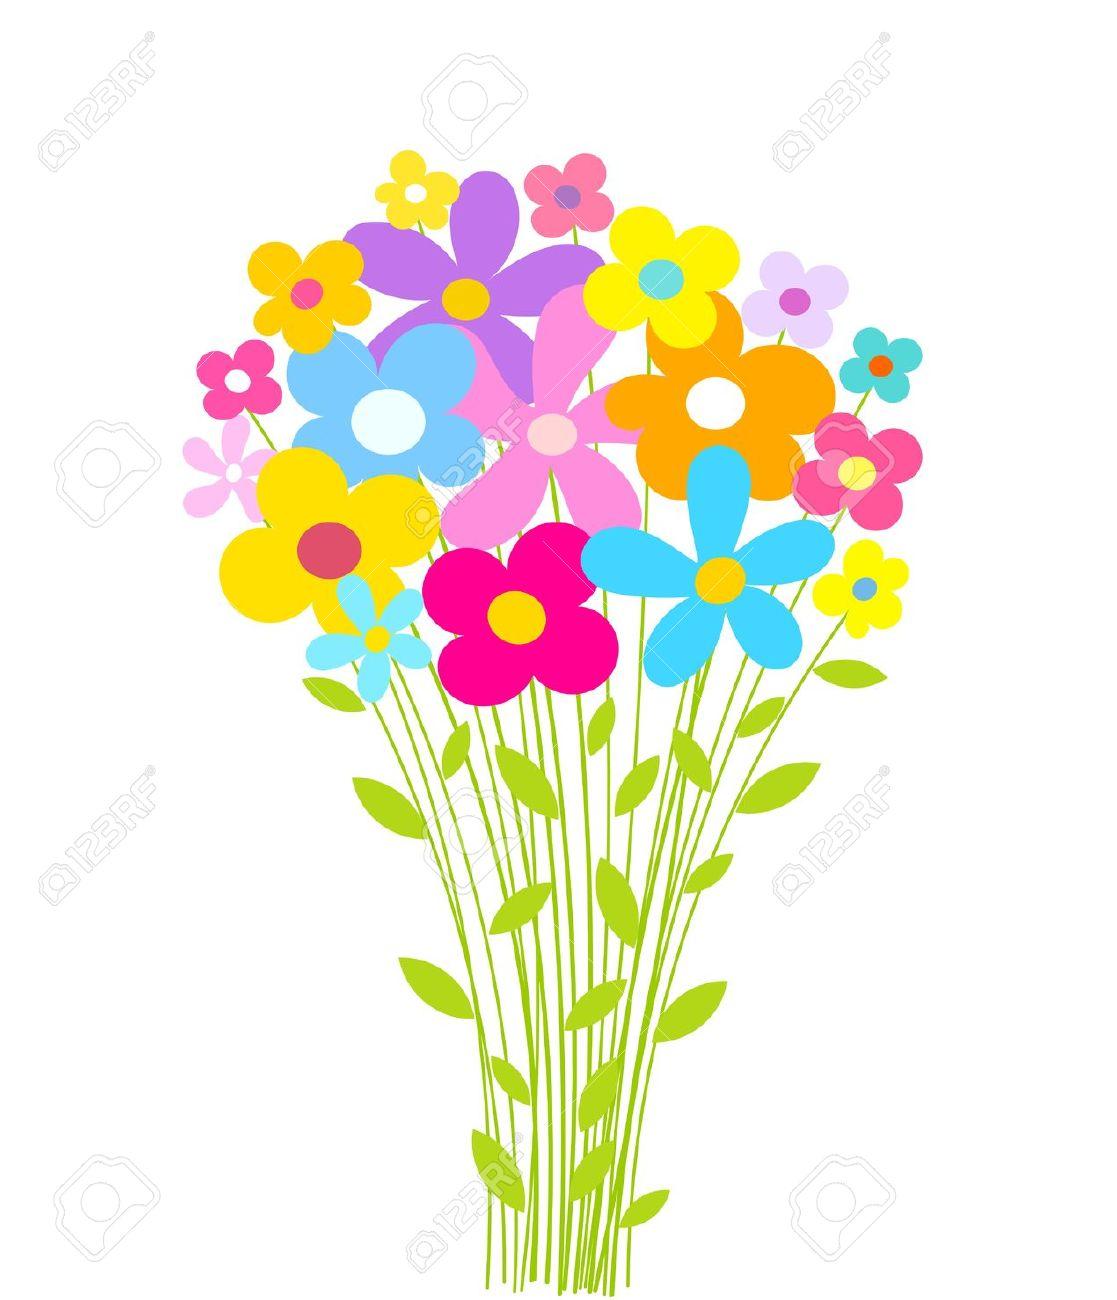 Bouquet clipart spring flower bouquet. Cute free